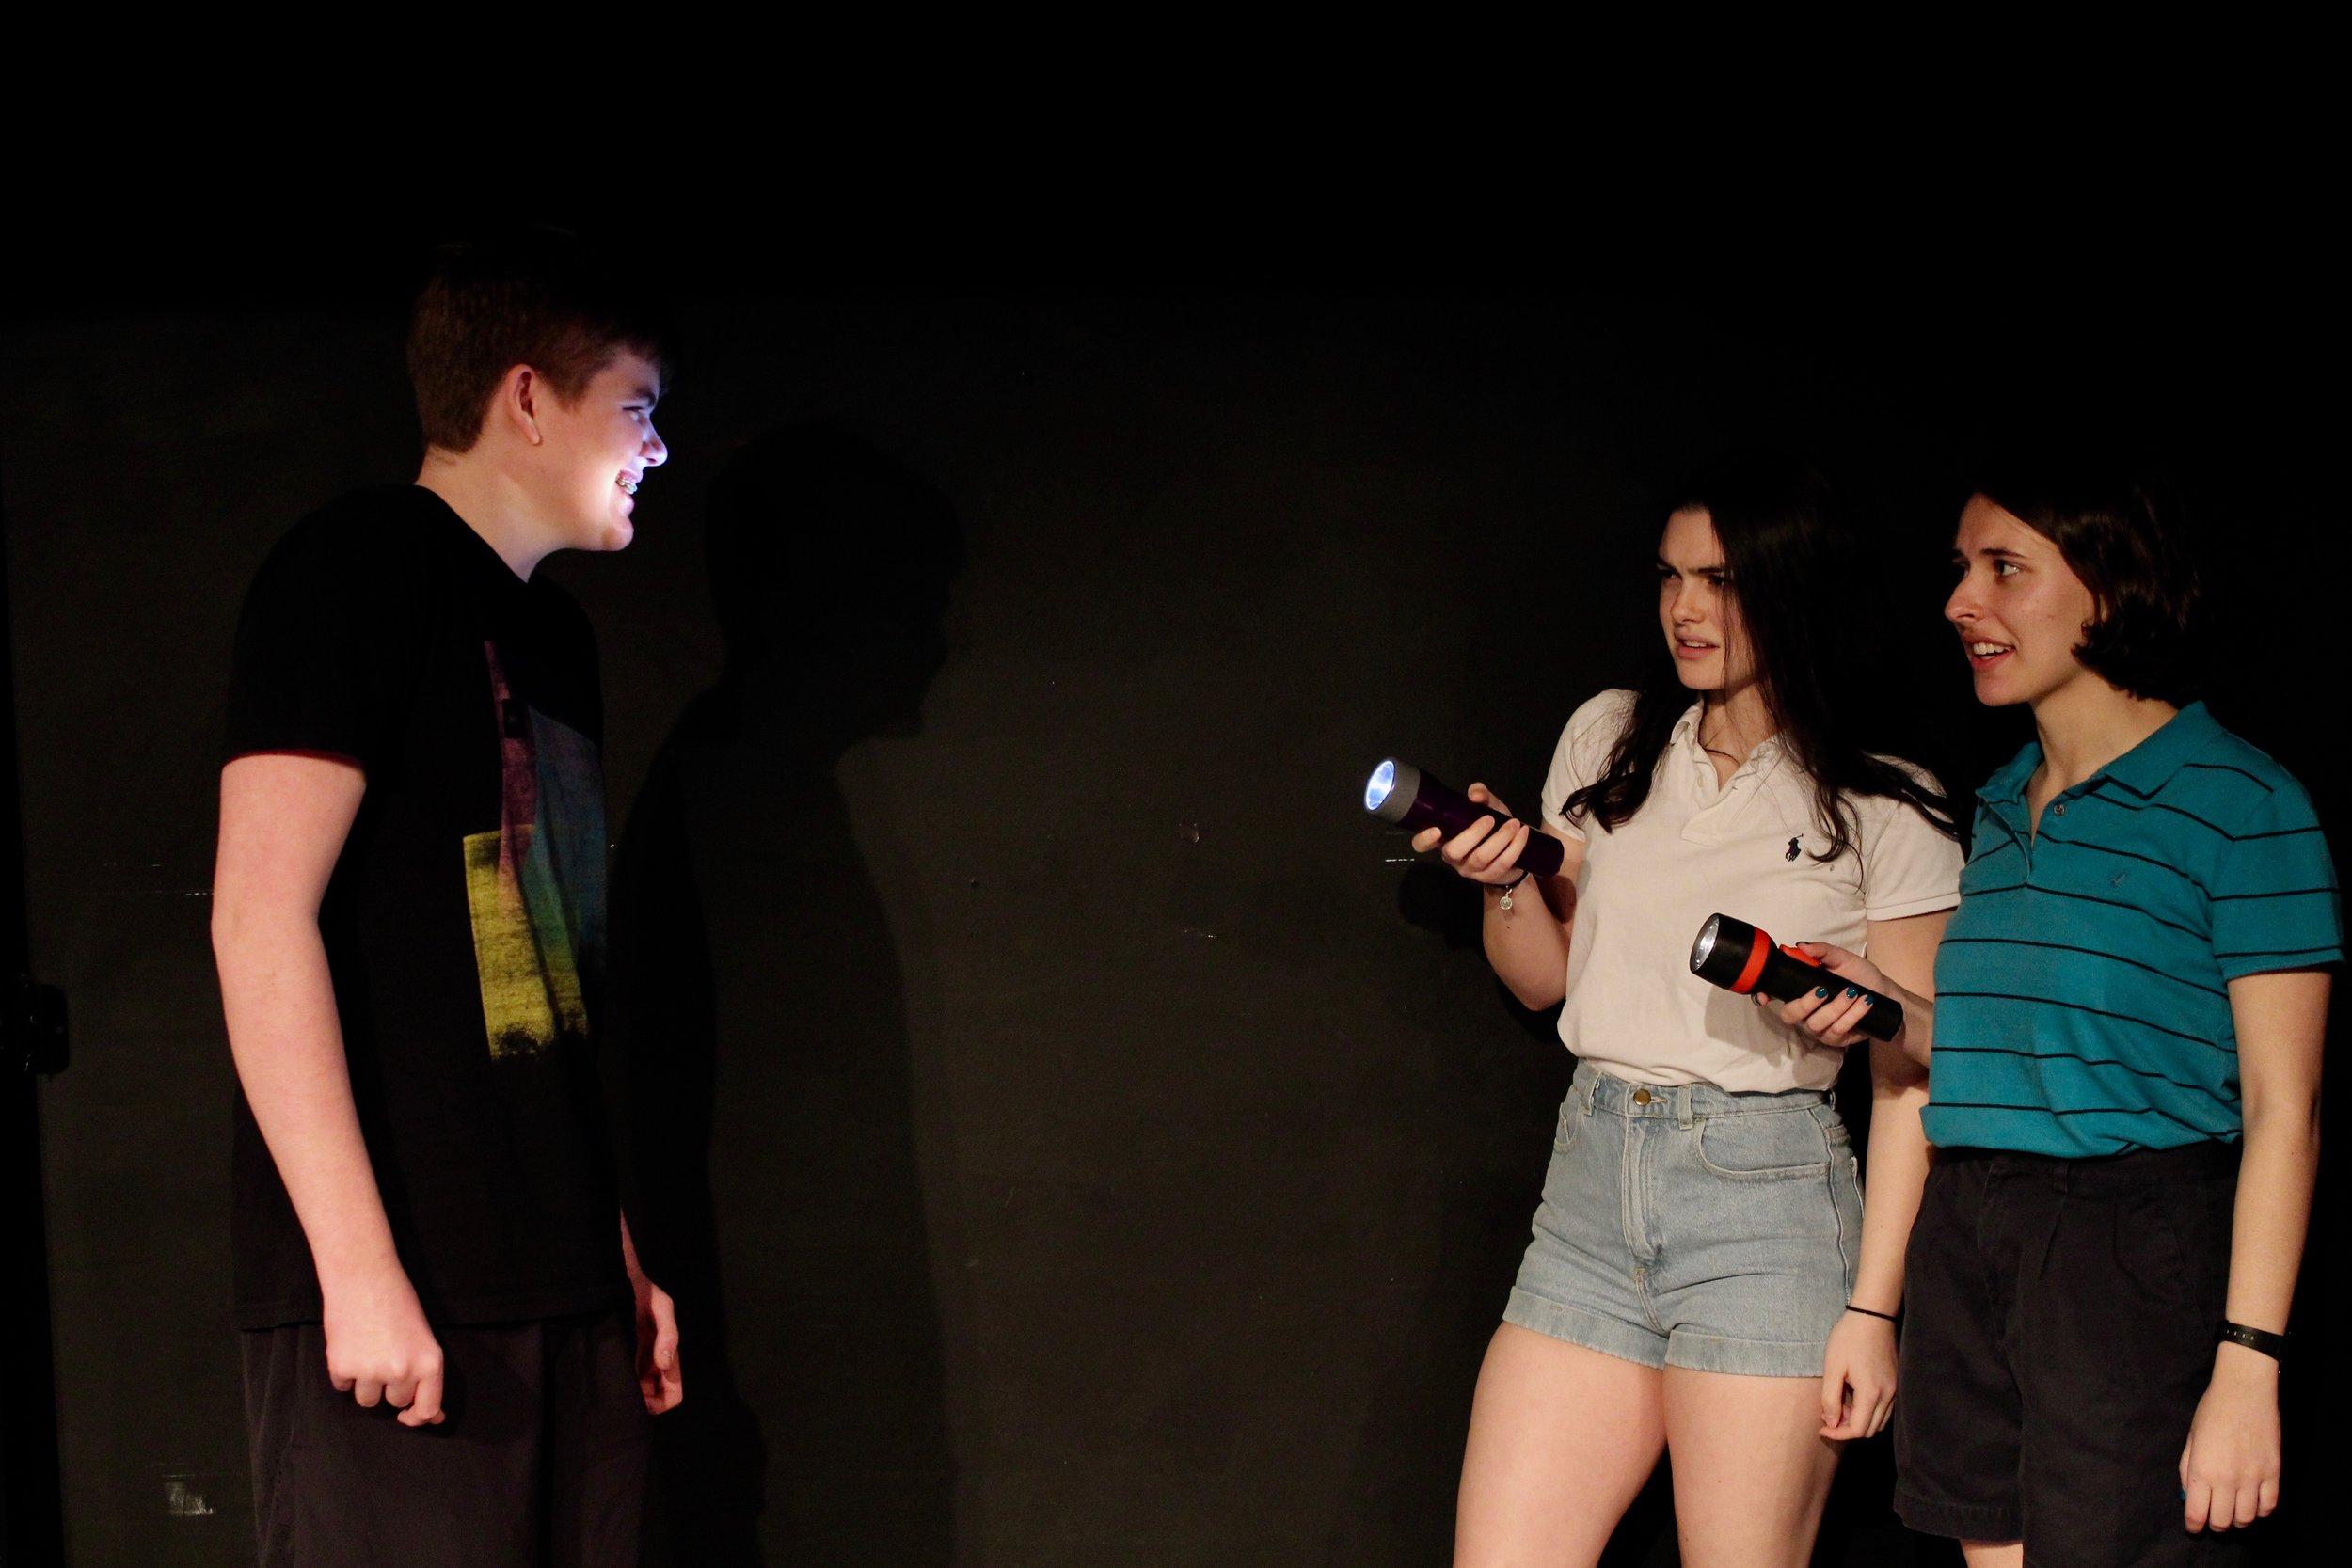 From left: Patrick Napolitano as Kurtz, Casey Rae Borella as Kiki, Katie Kunka as Loony